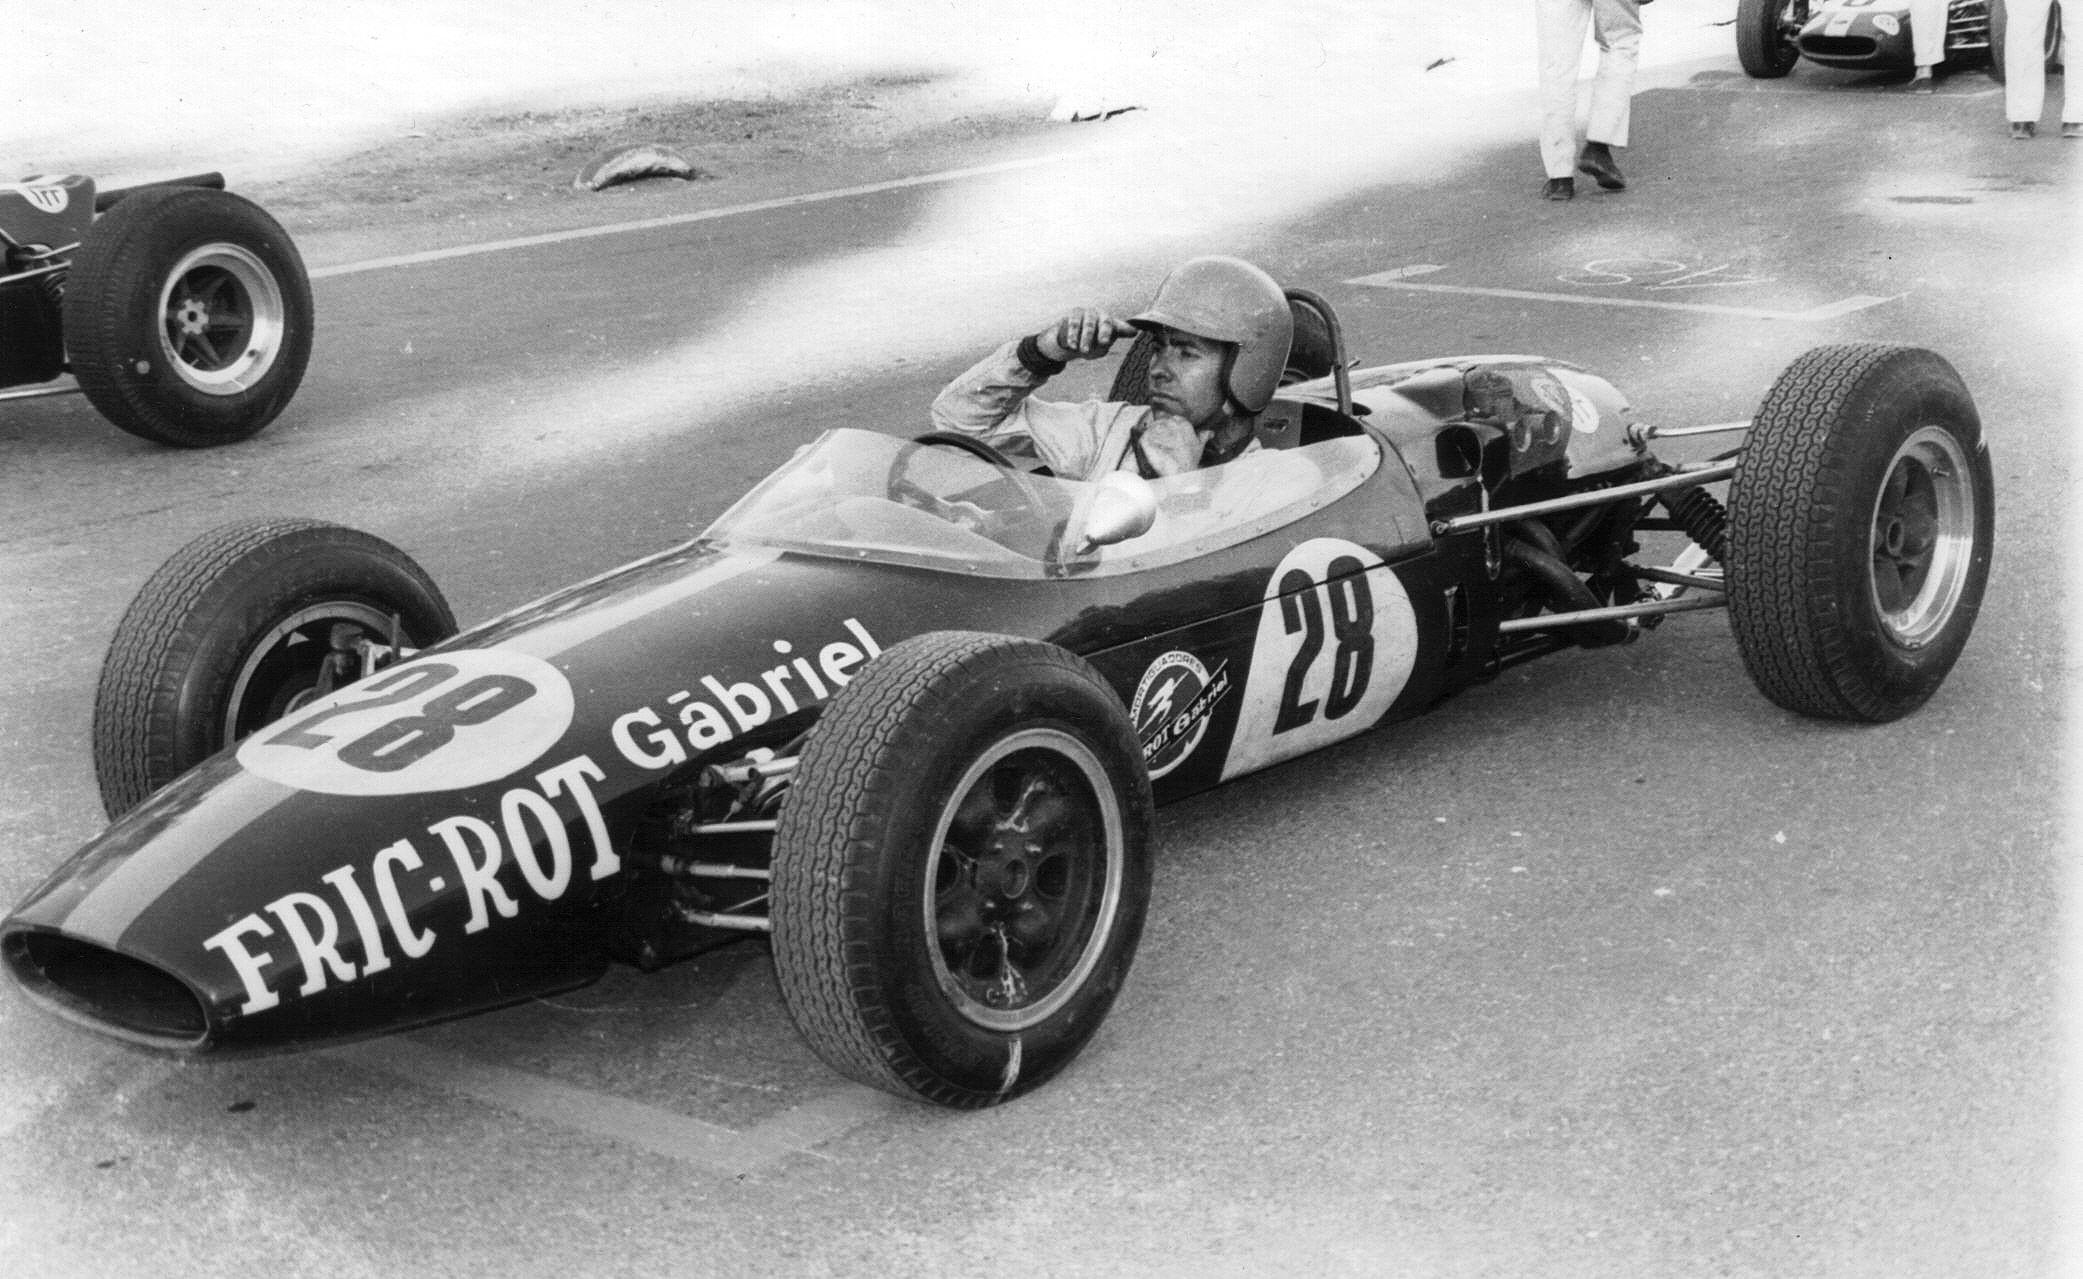 Martin Davies Brabham BT10 Rosario (RA) 30-01-66